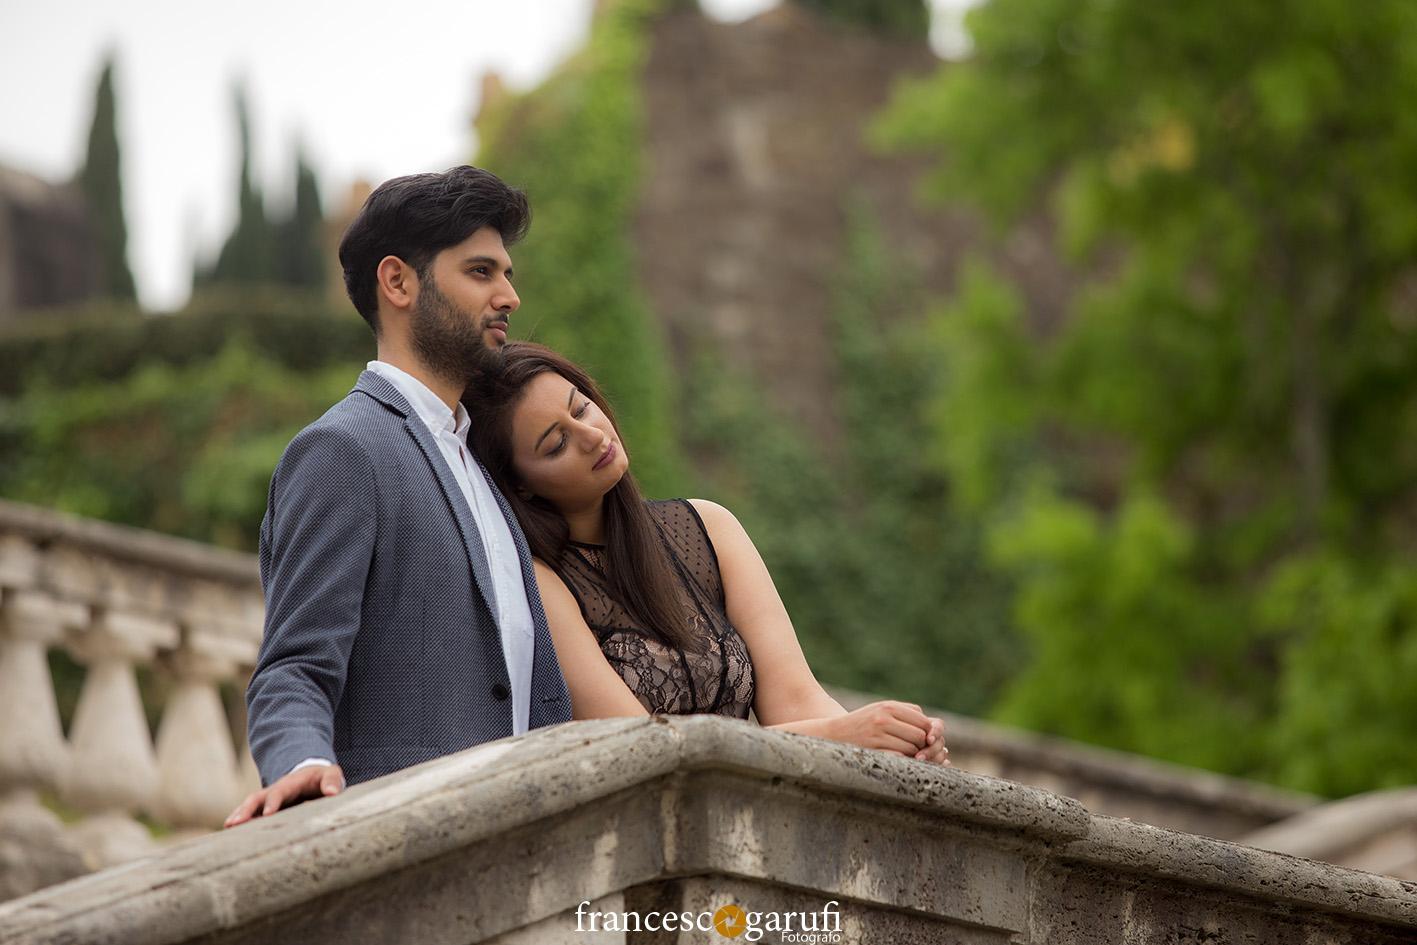 fotoracconto matrimonio indiano Firenze